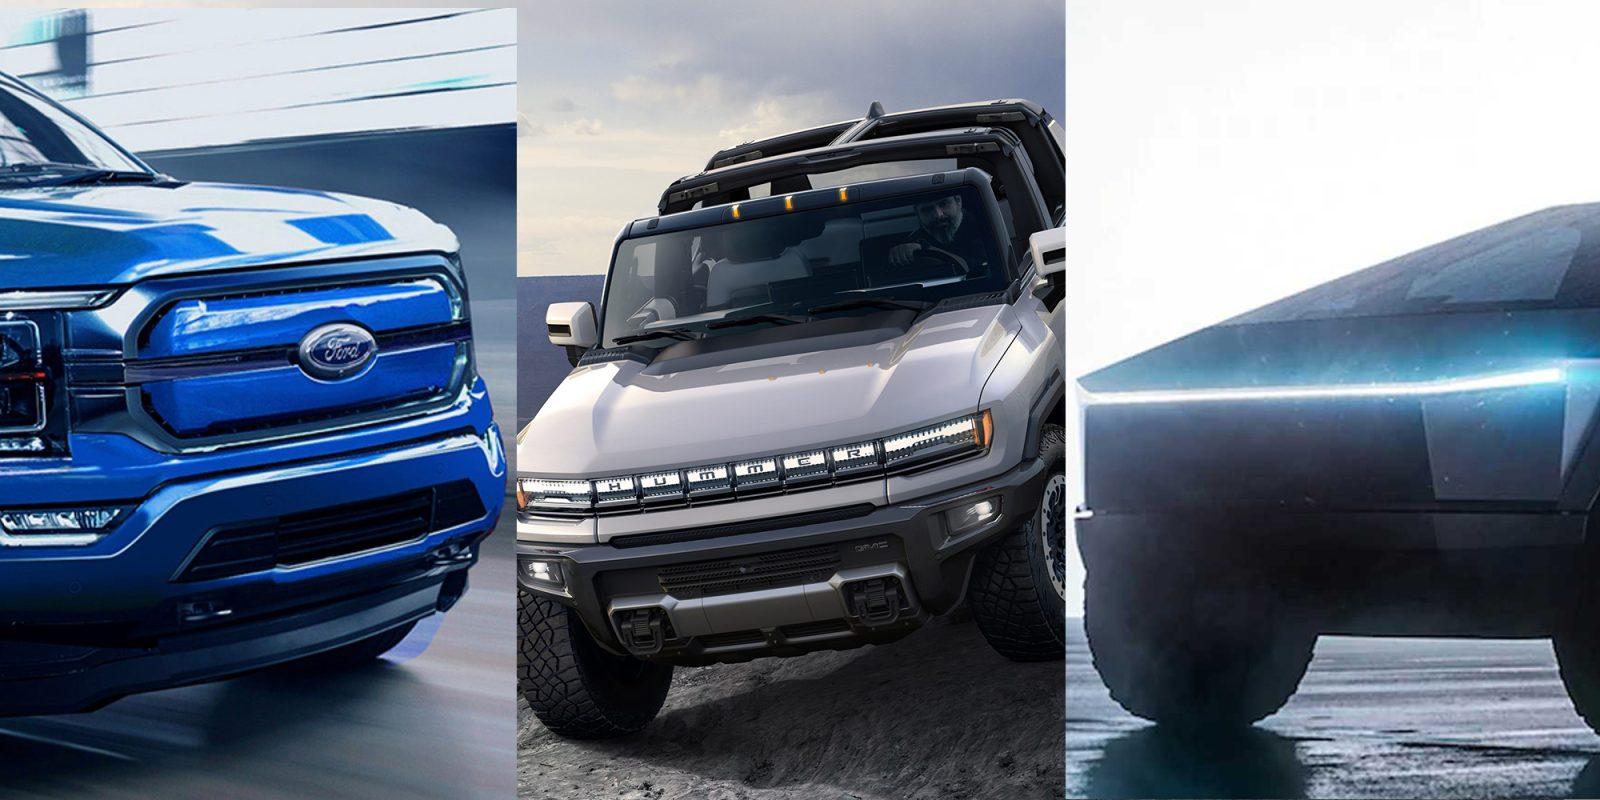 Upcoming electric trucks: Tesla Cybertruck, Ford F-150 EV, and GMC Hummer EV compared - Electrek